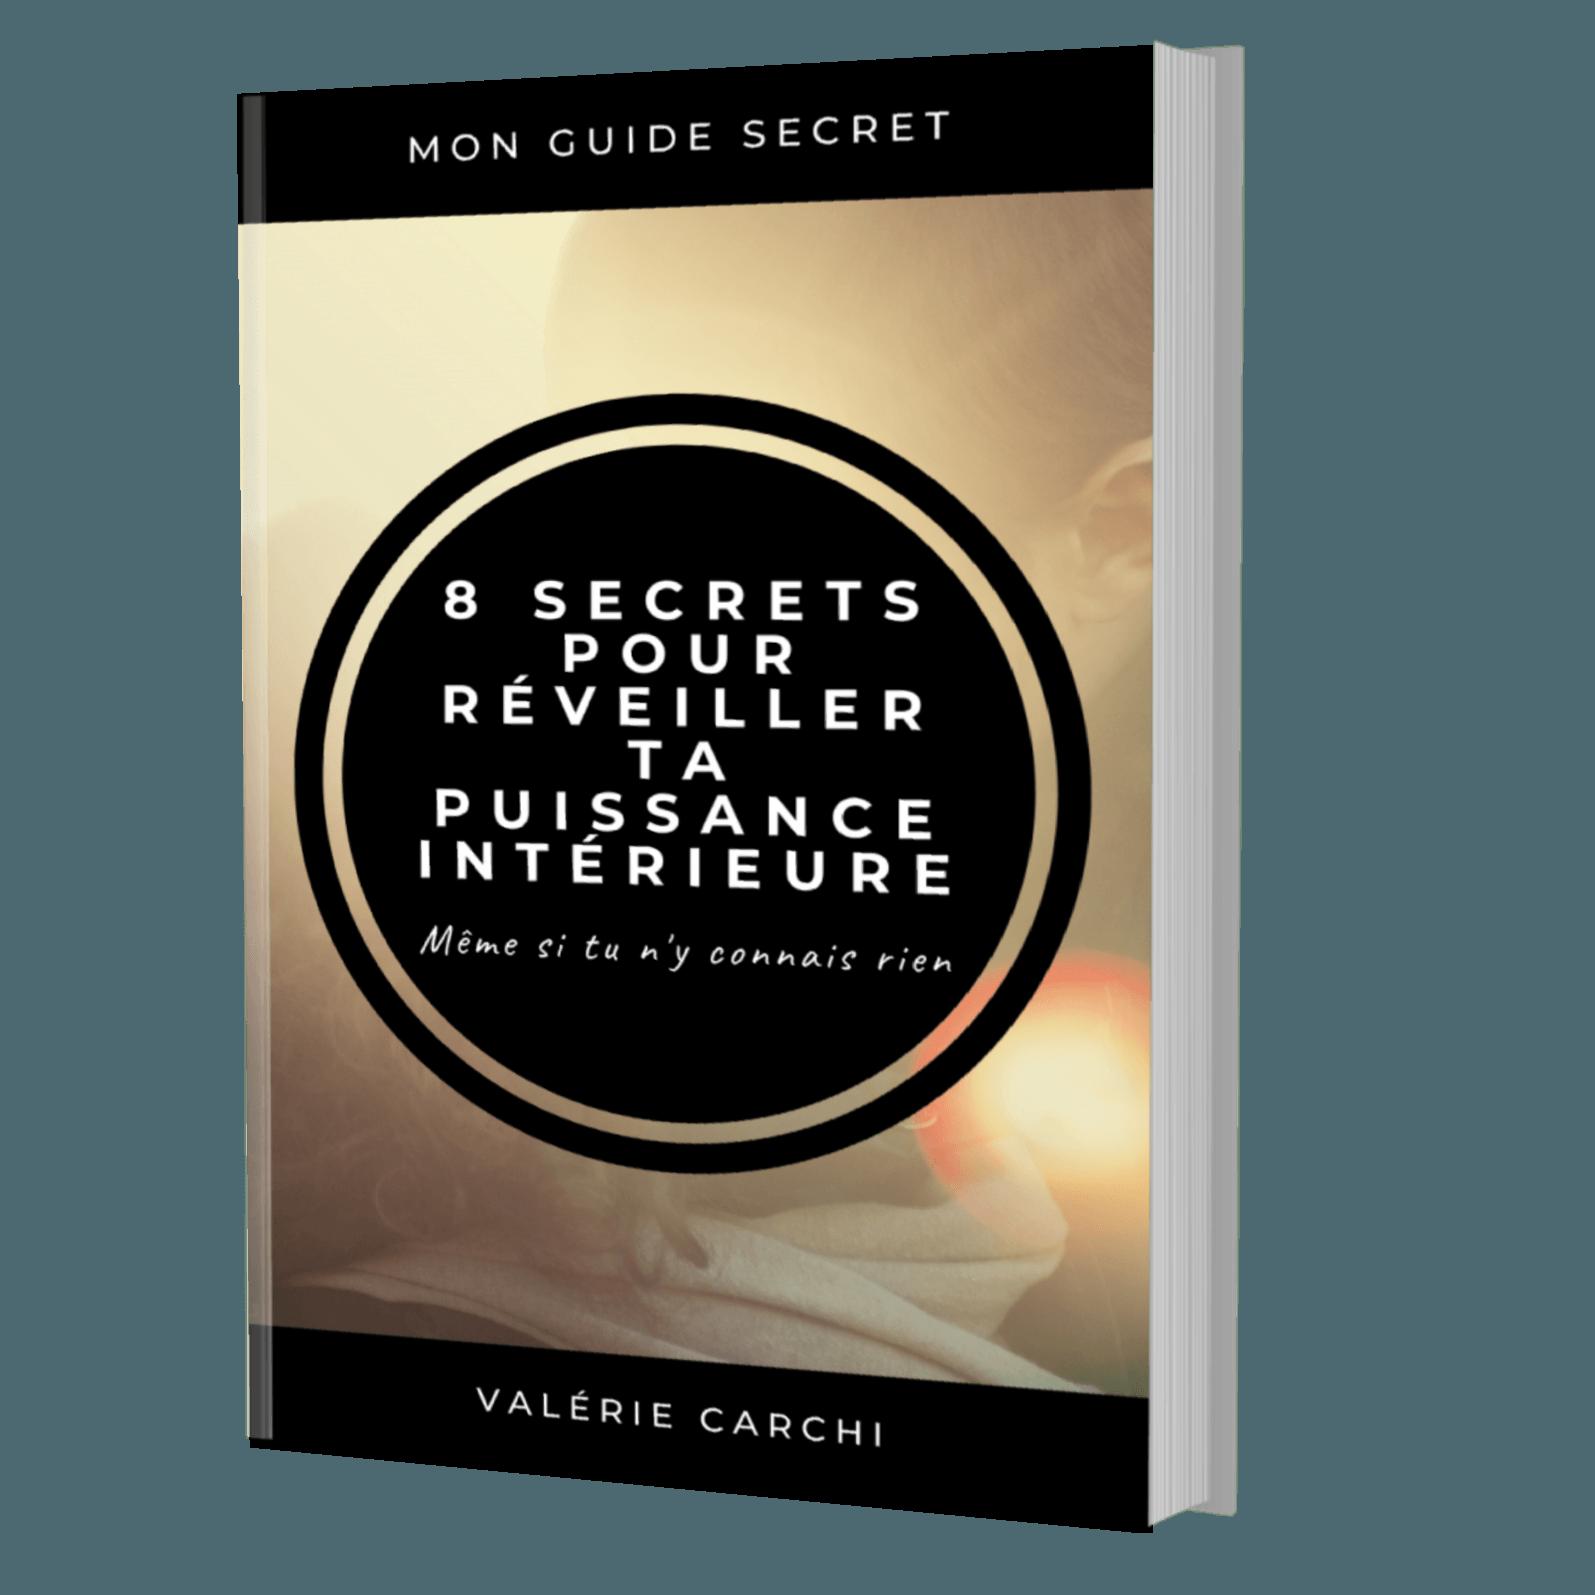 VISUEL EBOOK GUIDE SECRET REVEILLER PUISSANCE INTERIEURE